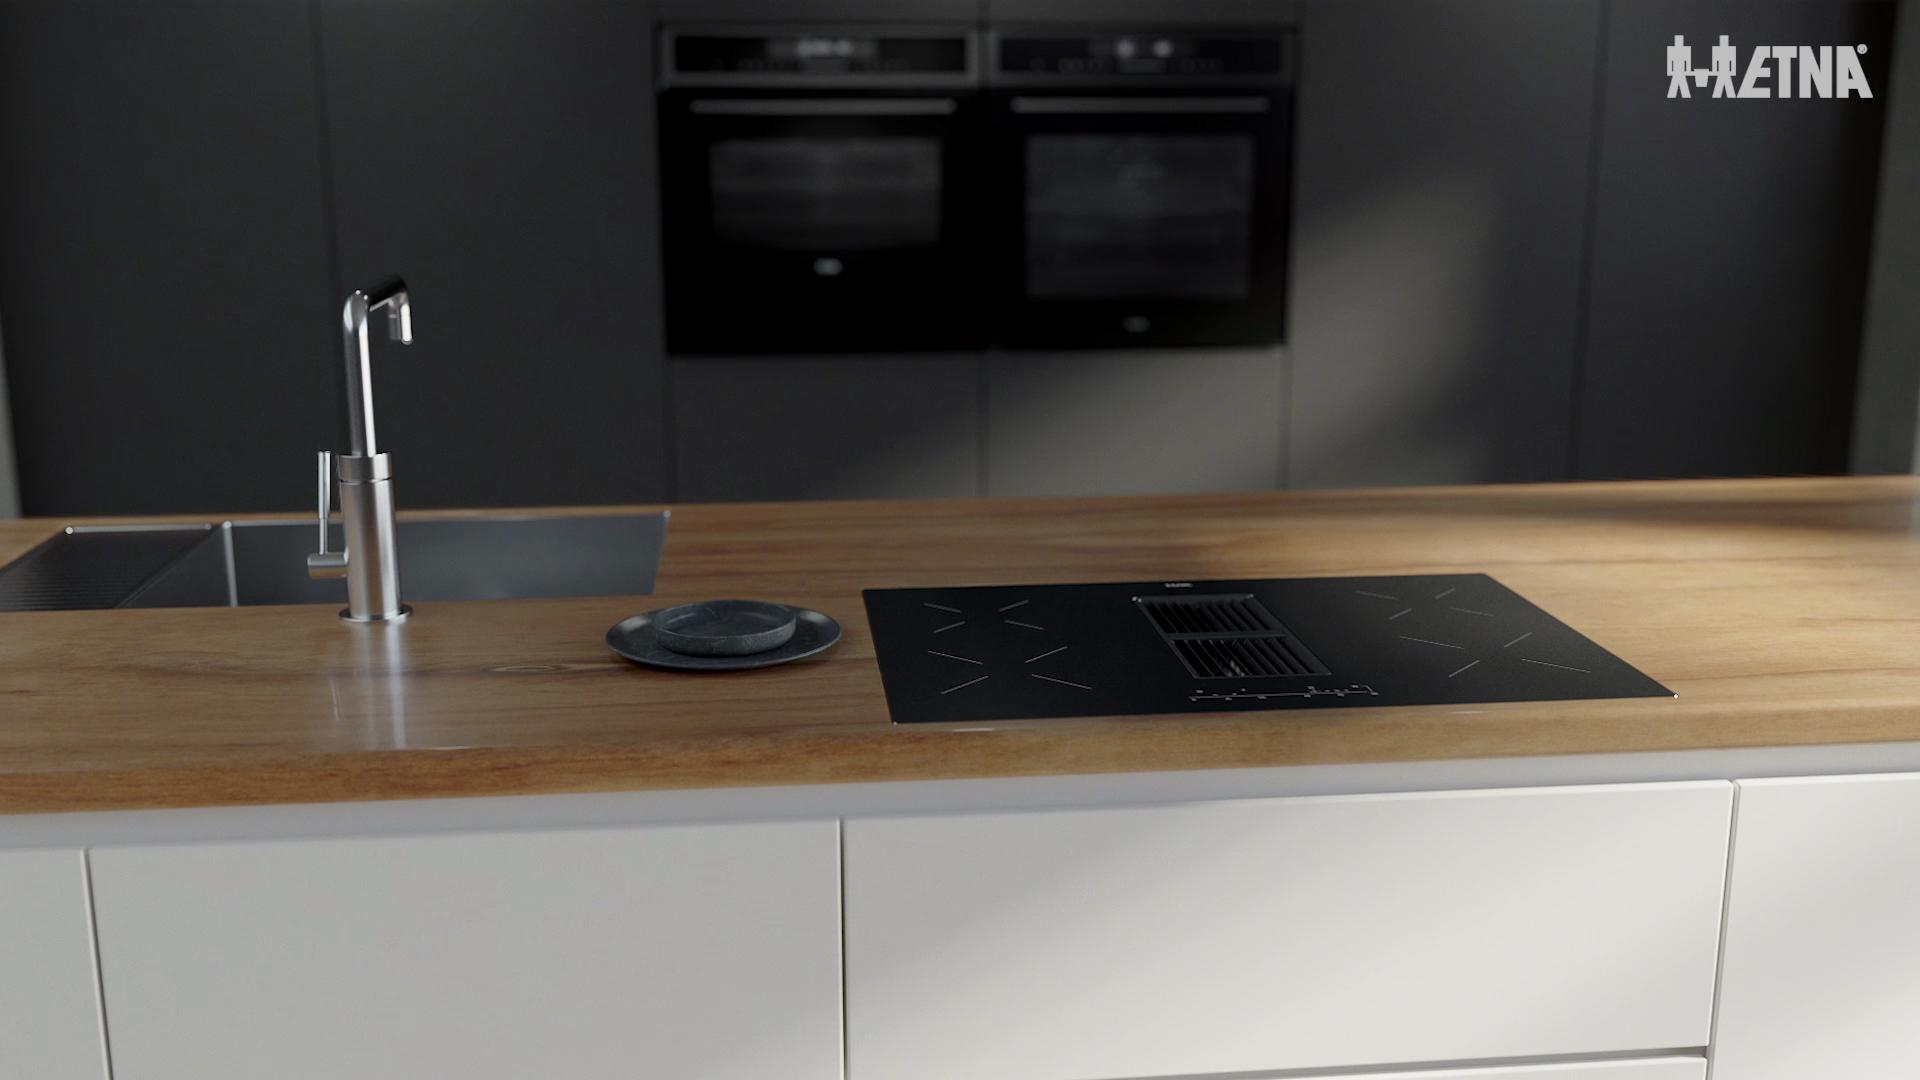 AKI480ZT - Product Reveal